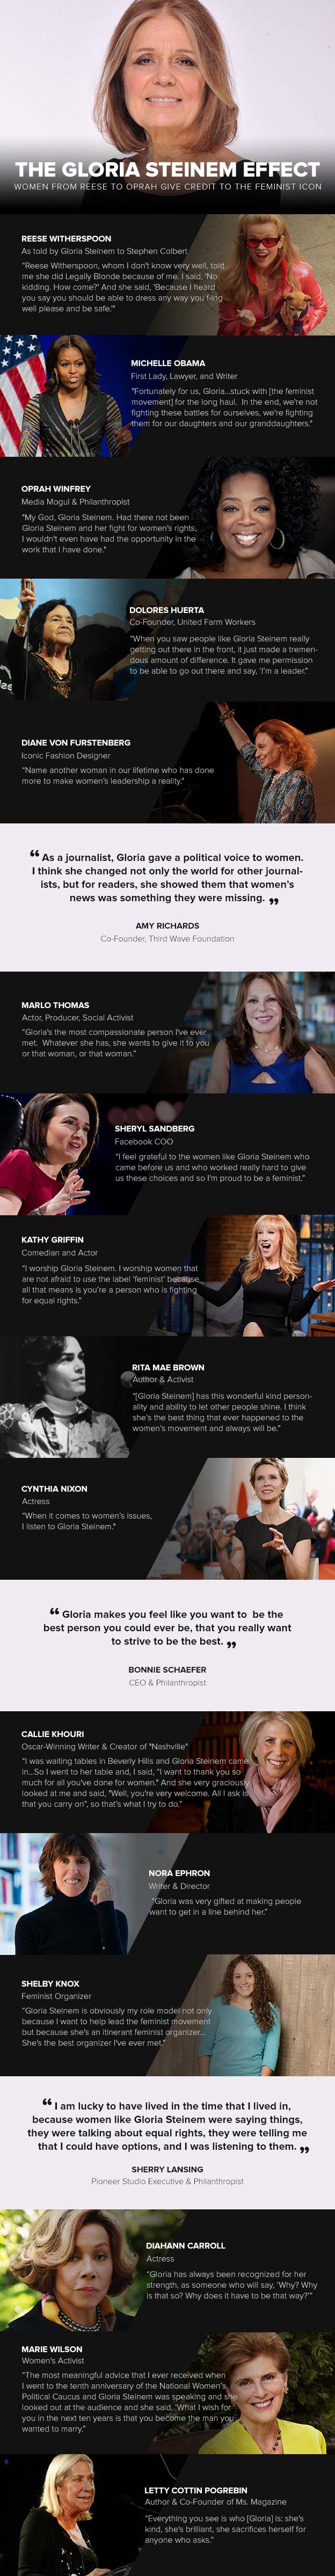 19 Powerful Women on 'The Gloria Steinem Effect'